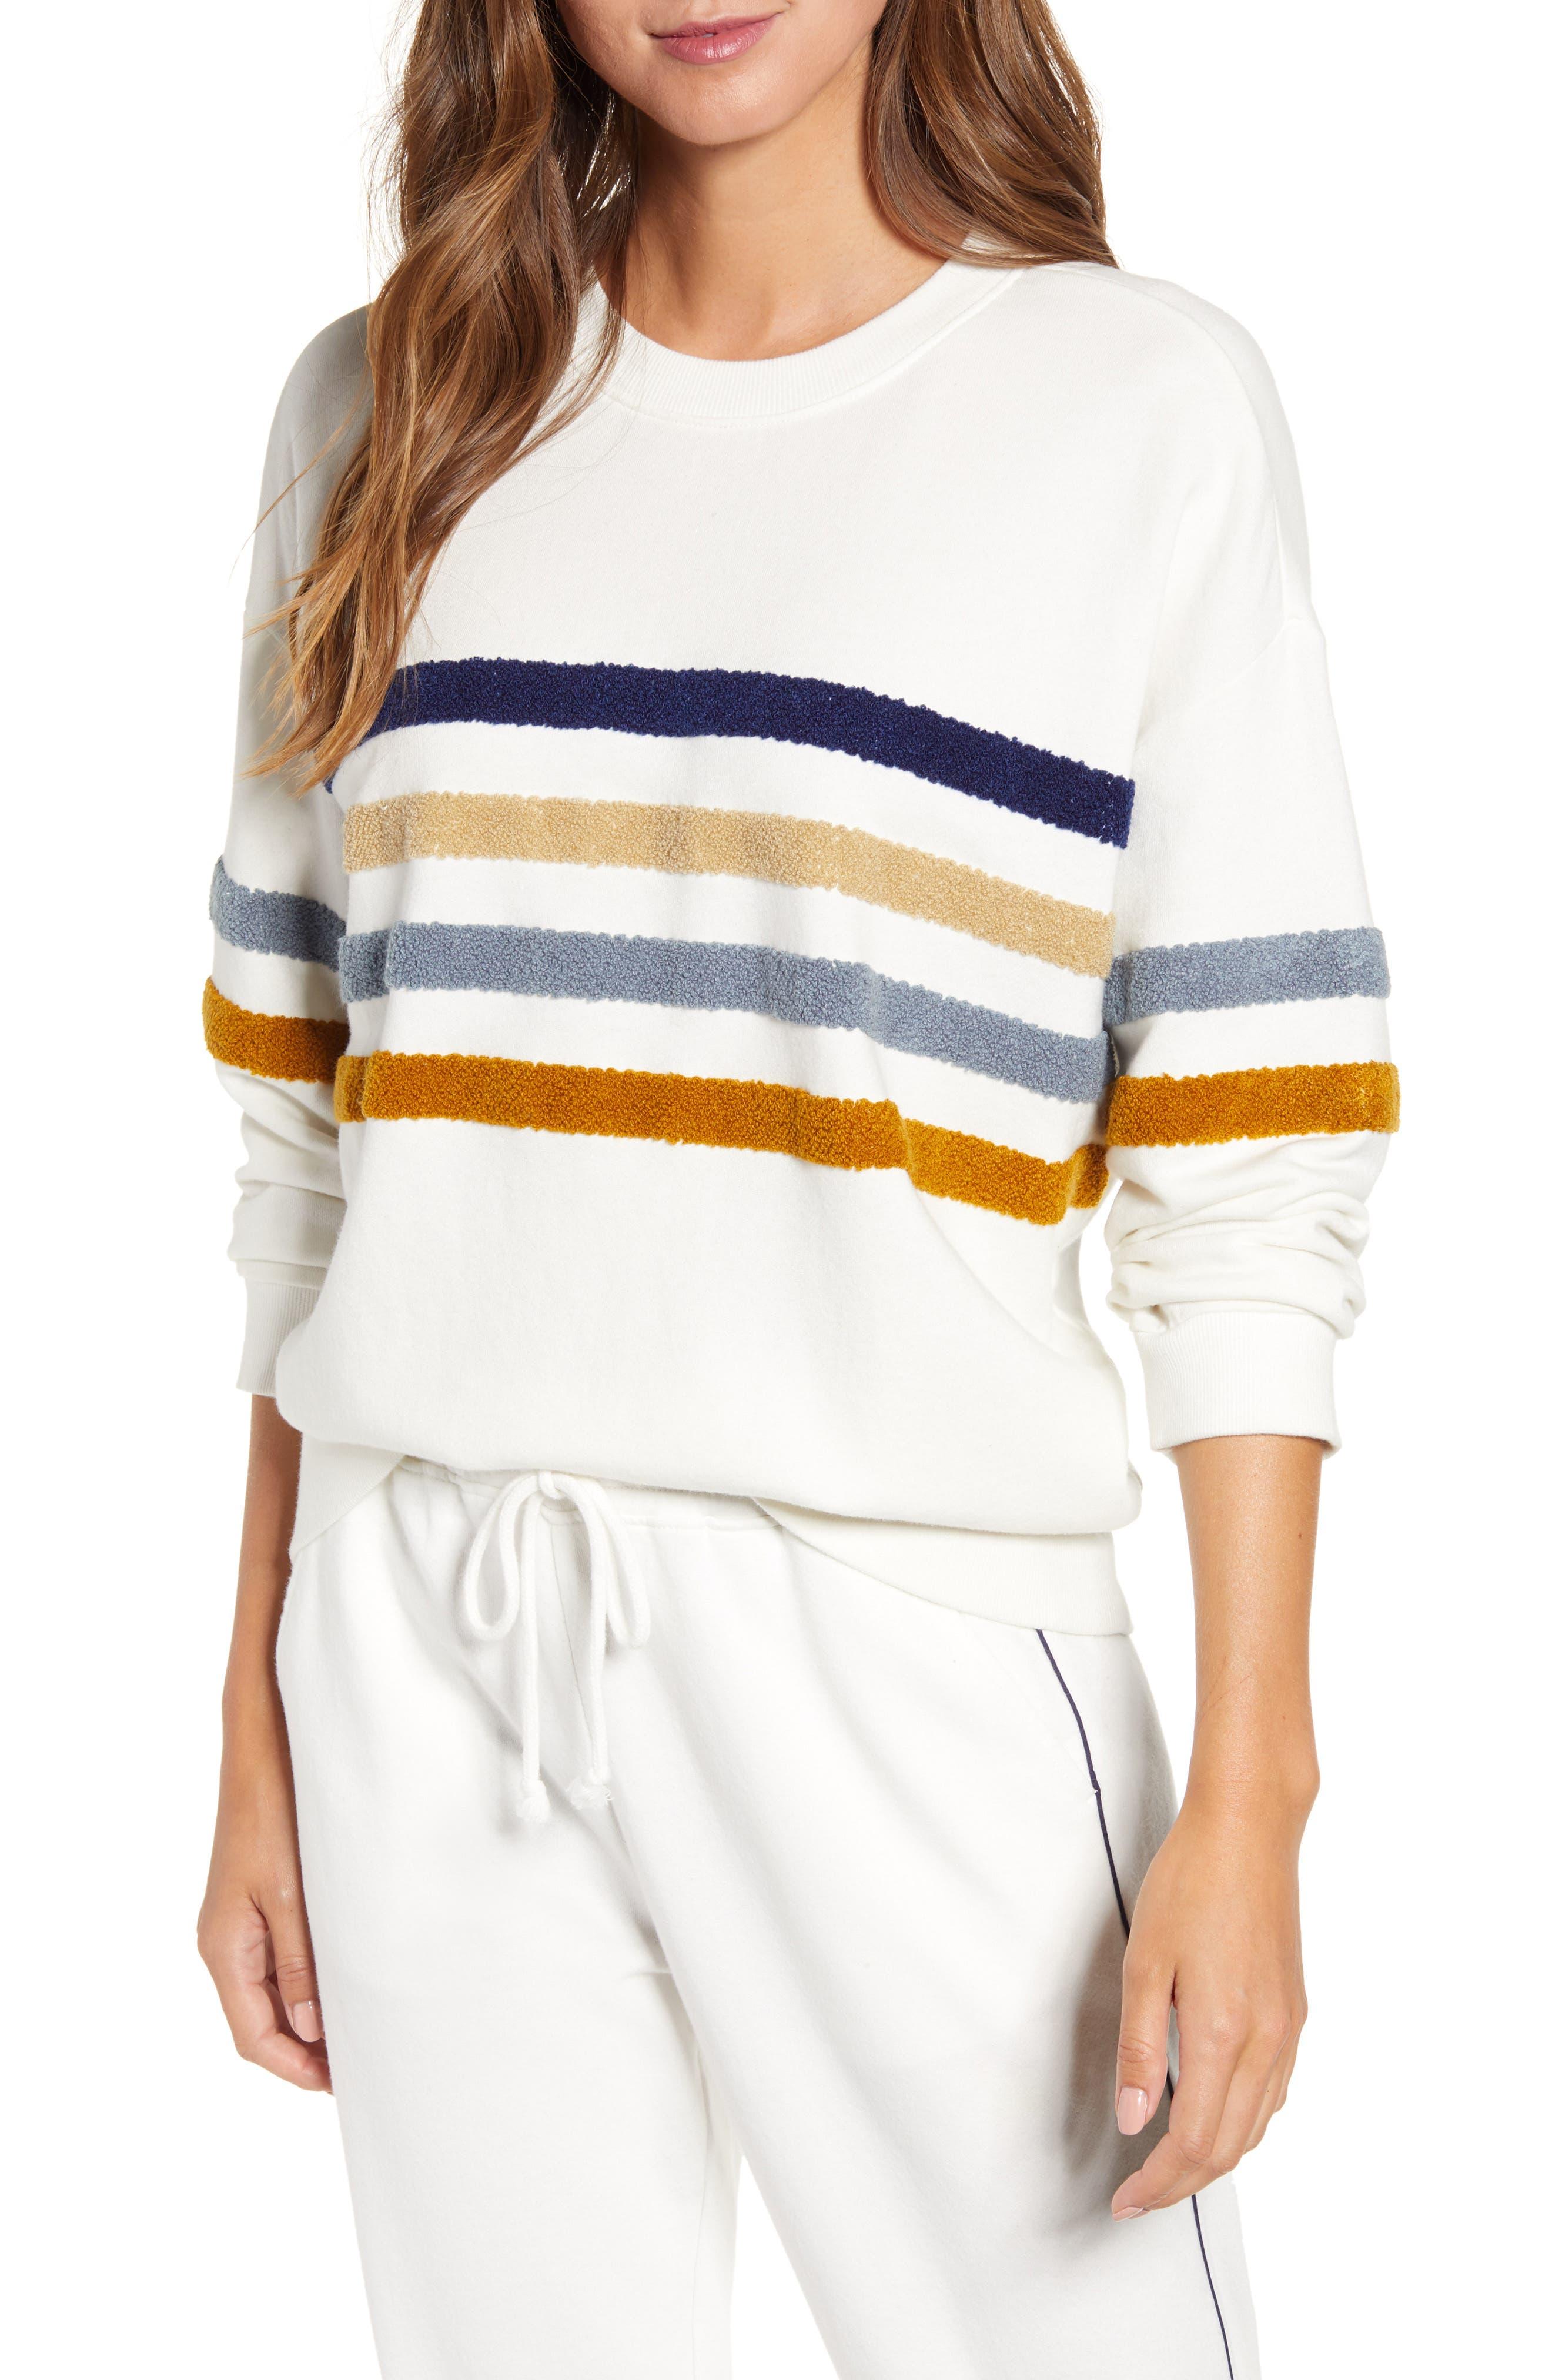 Lou & Grey Fuzzstripe Terry Sweatshirt